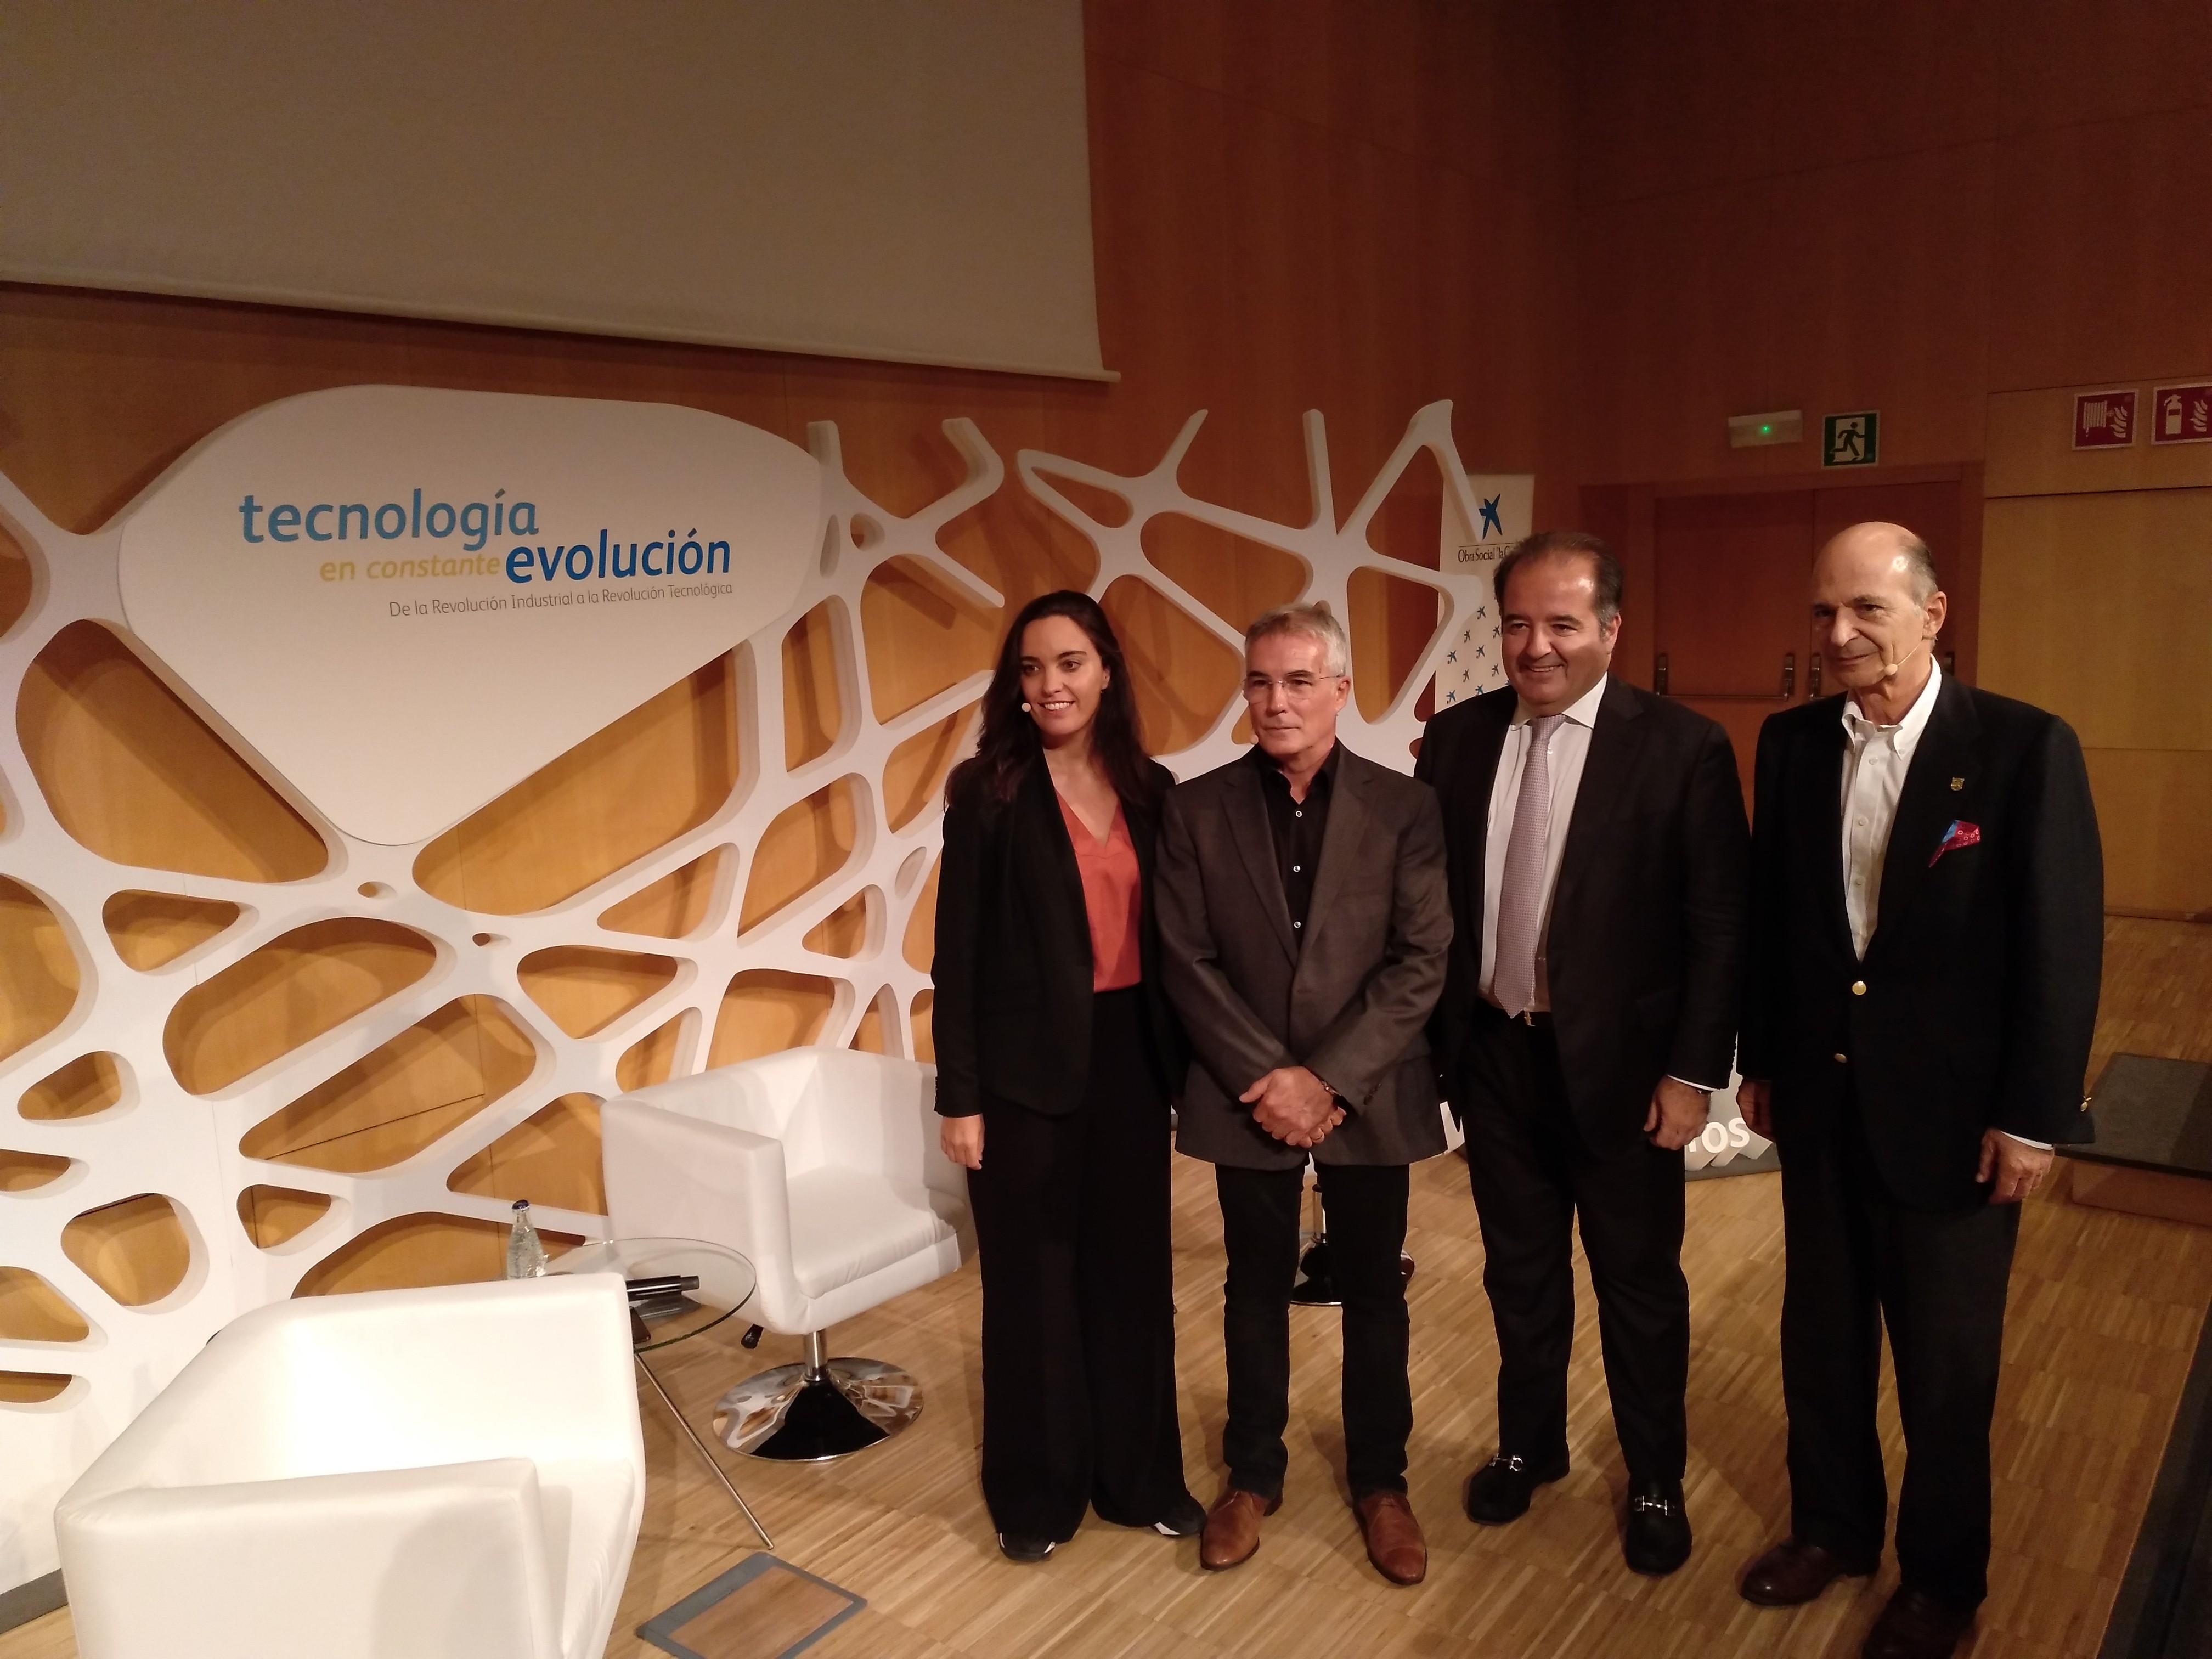 XXaniversario_jornada_tecnologia_barcelona